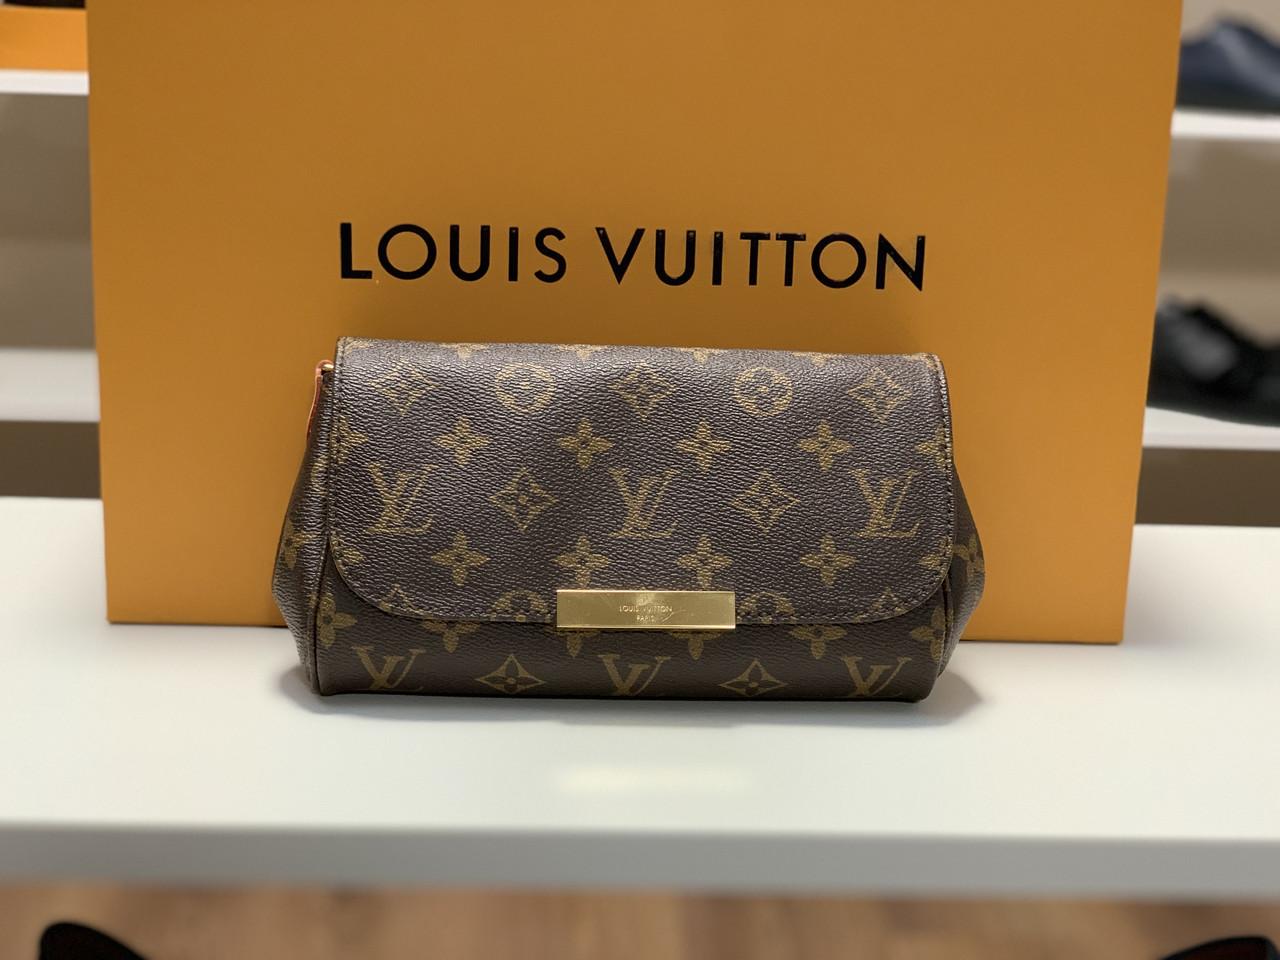 bb3b5485fd2c Женский клатч Louis Vuitton Favorite Monogram, цена 3 600 грн ...